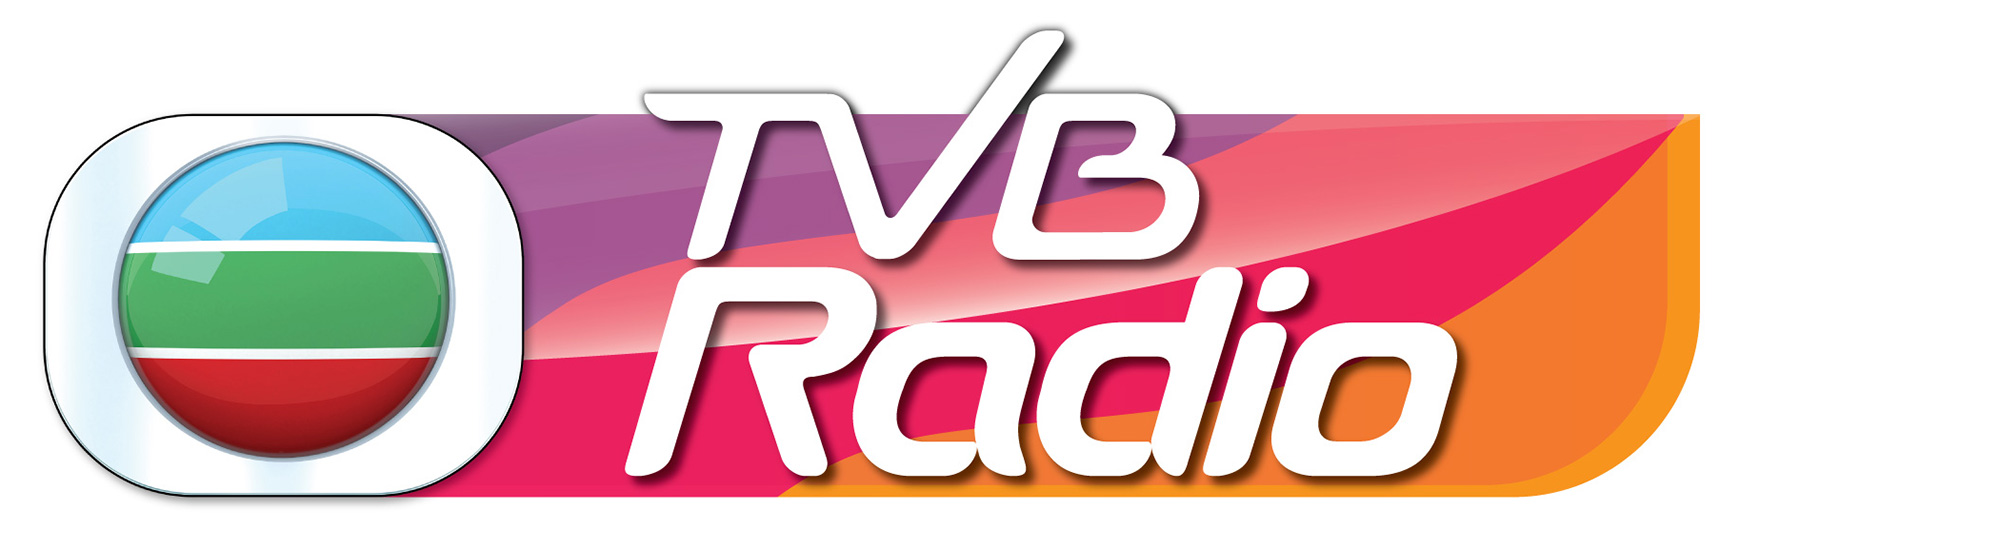 TVB Radio